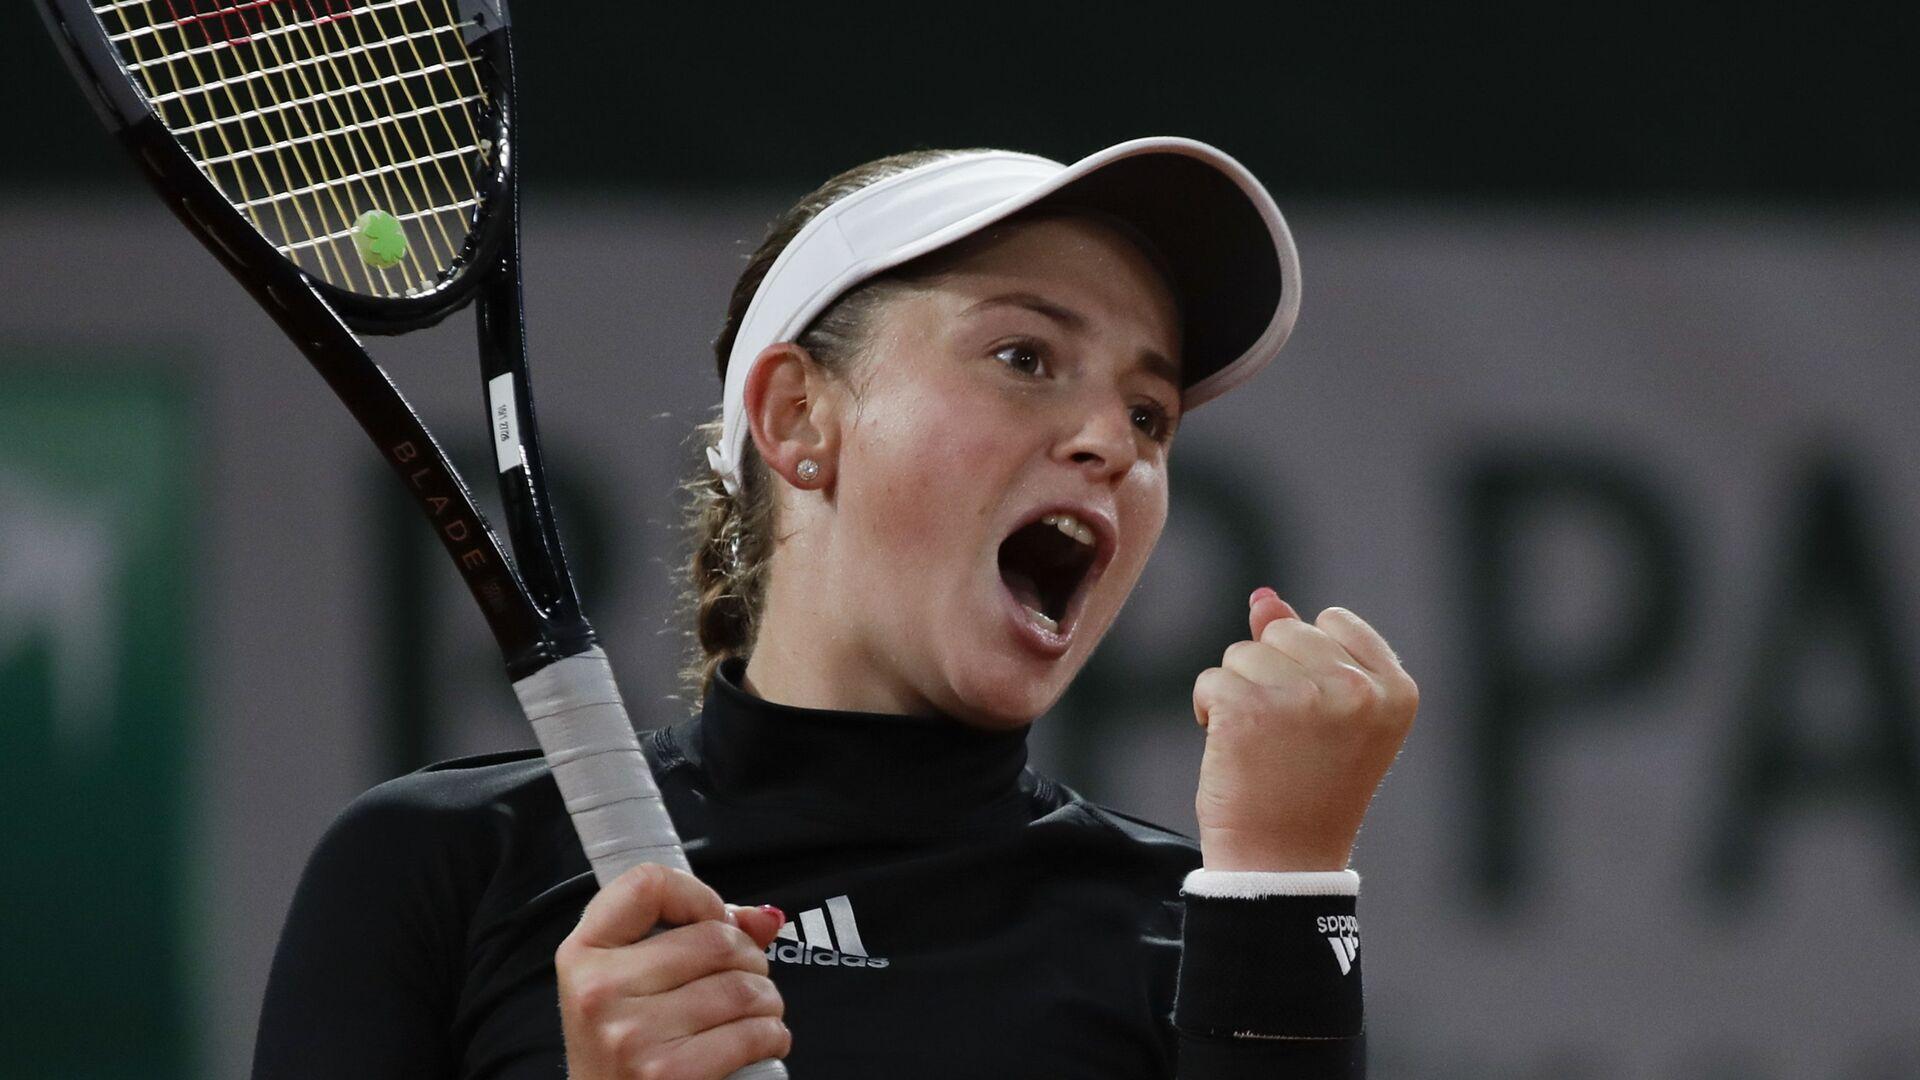 Латвийская теннисистка Елена Остапенко - Sputnik Латвия, 1920, 01.06.2021